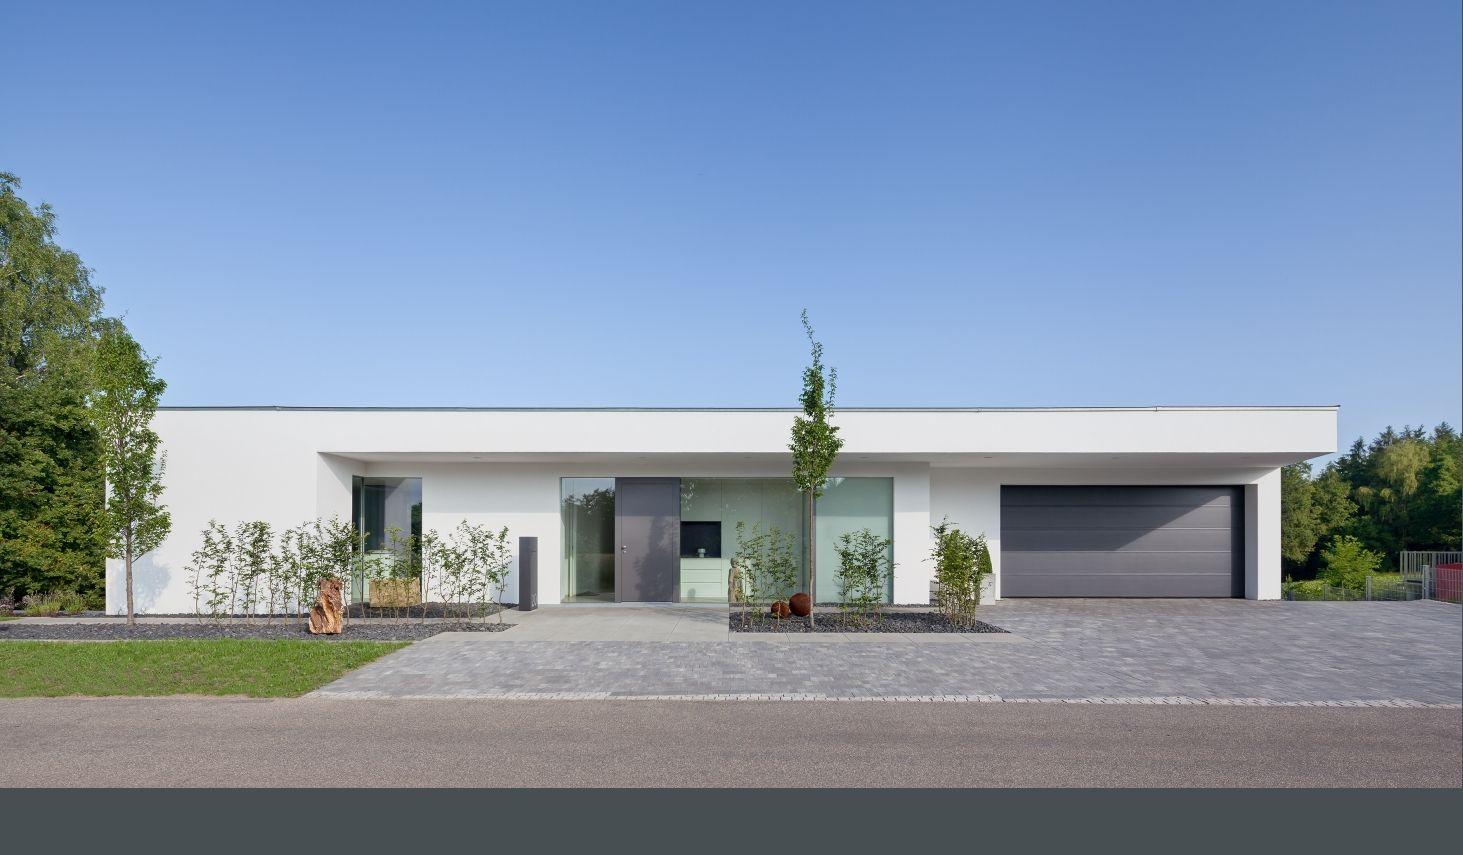 Neubau wh g berg 2013 haus pinterest abs bungalow for Architekten bungalow modern